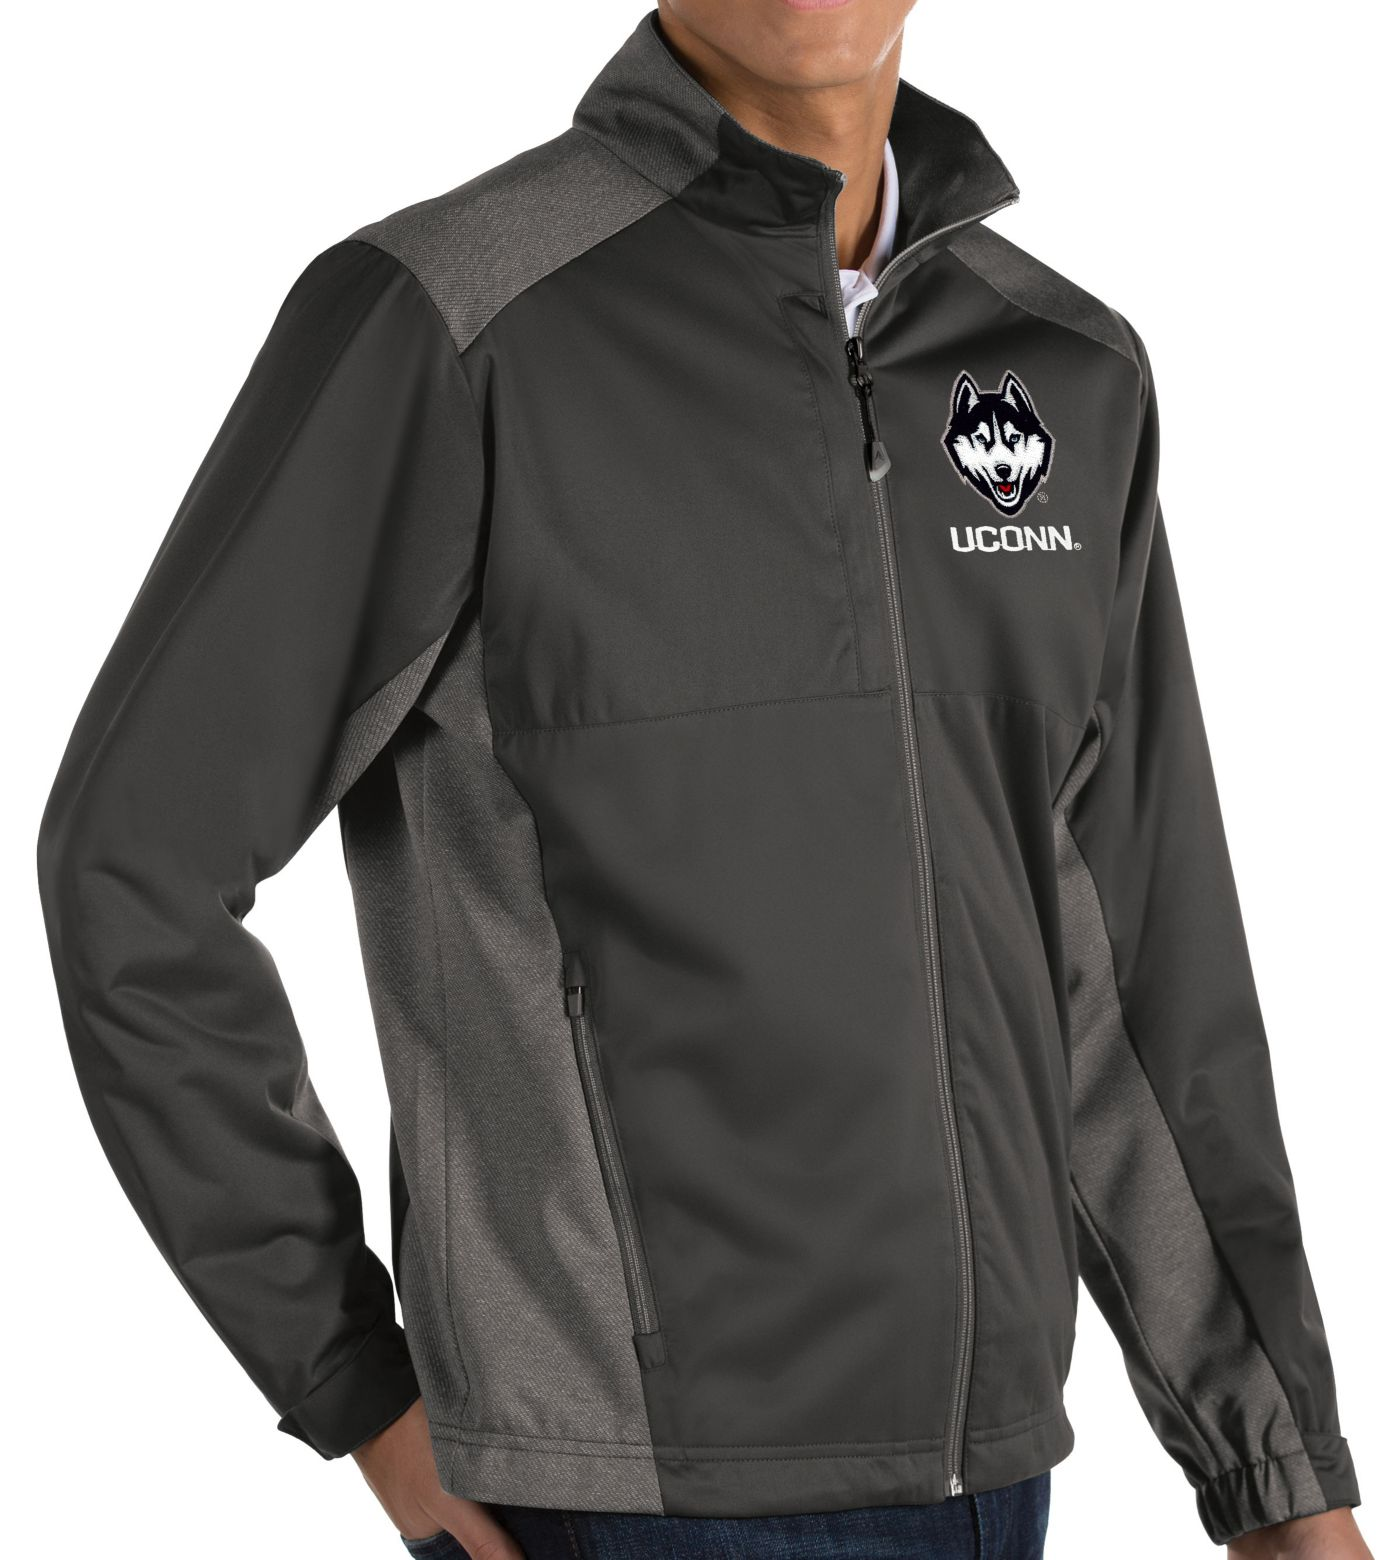 Antigua Men's UConn Huskies Grey Revolve Full-Zip Jacket